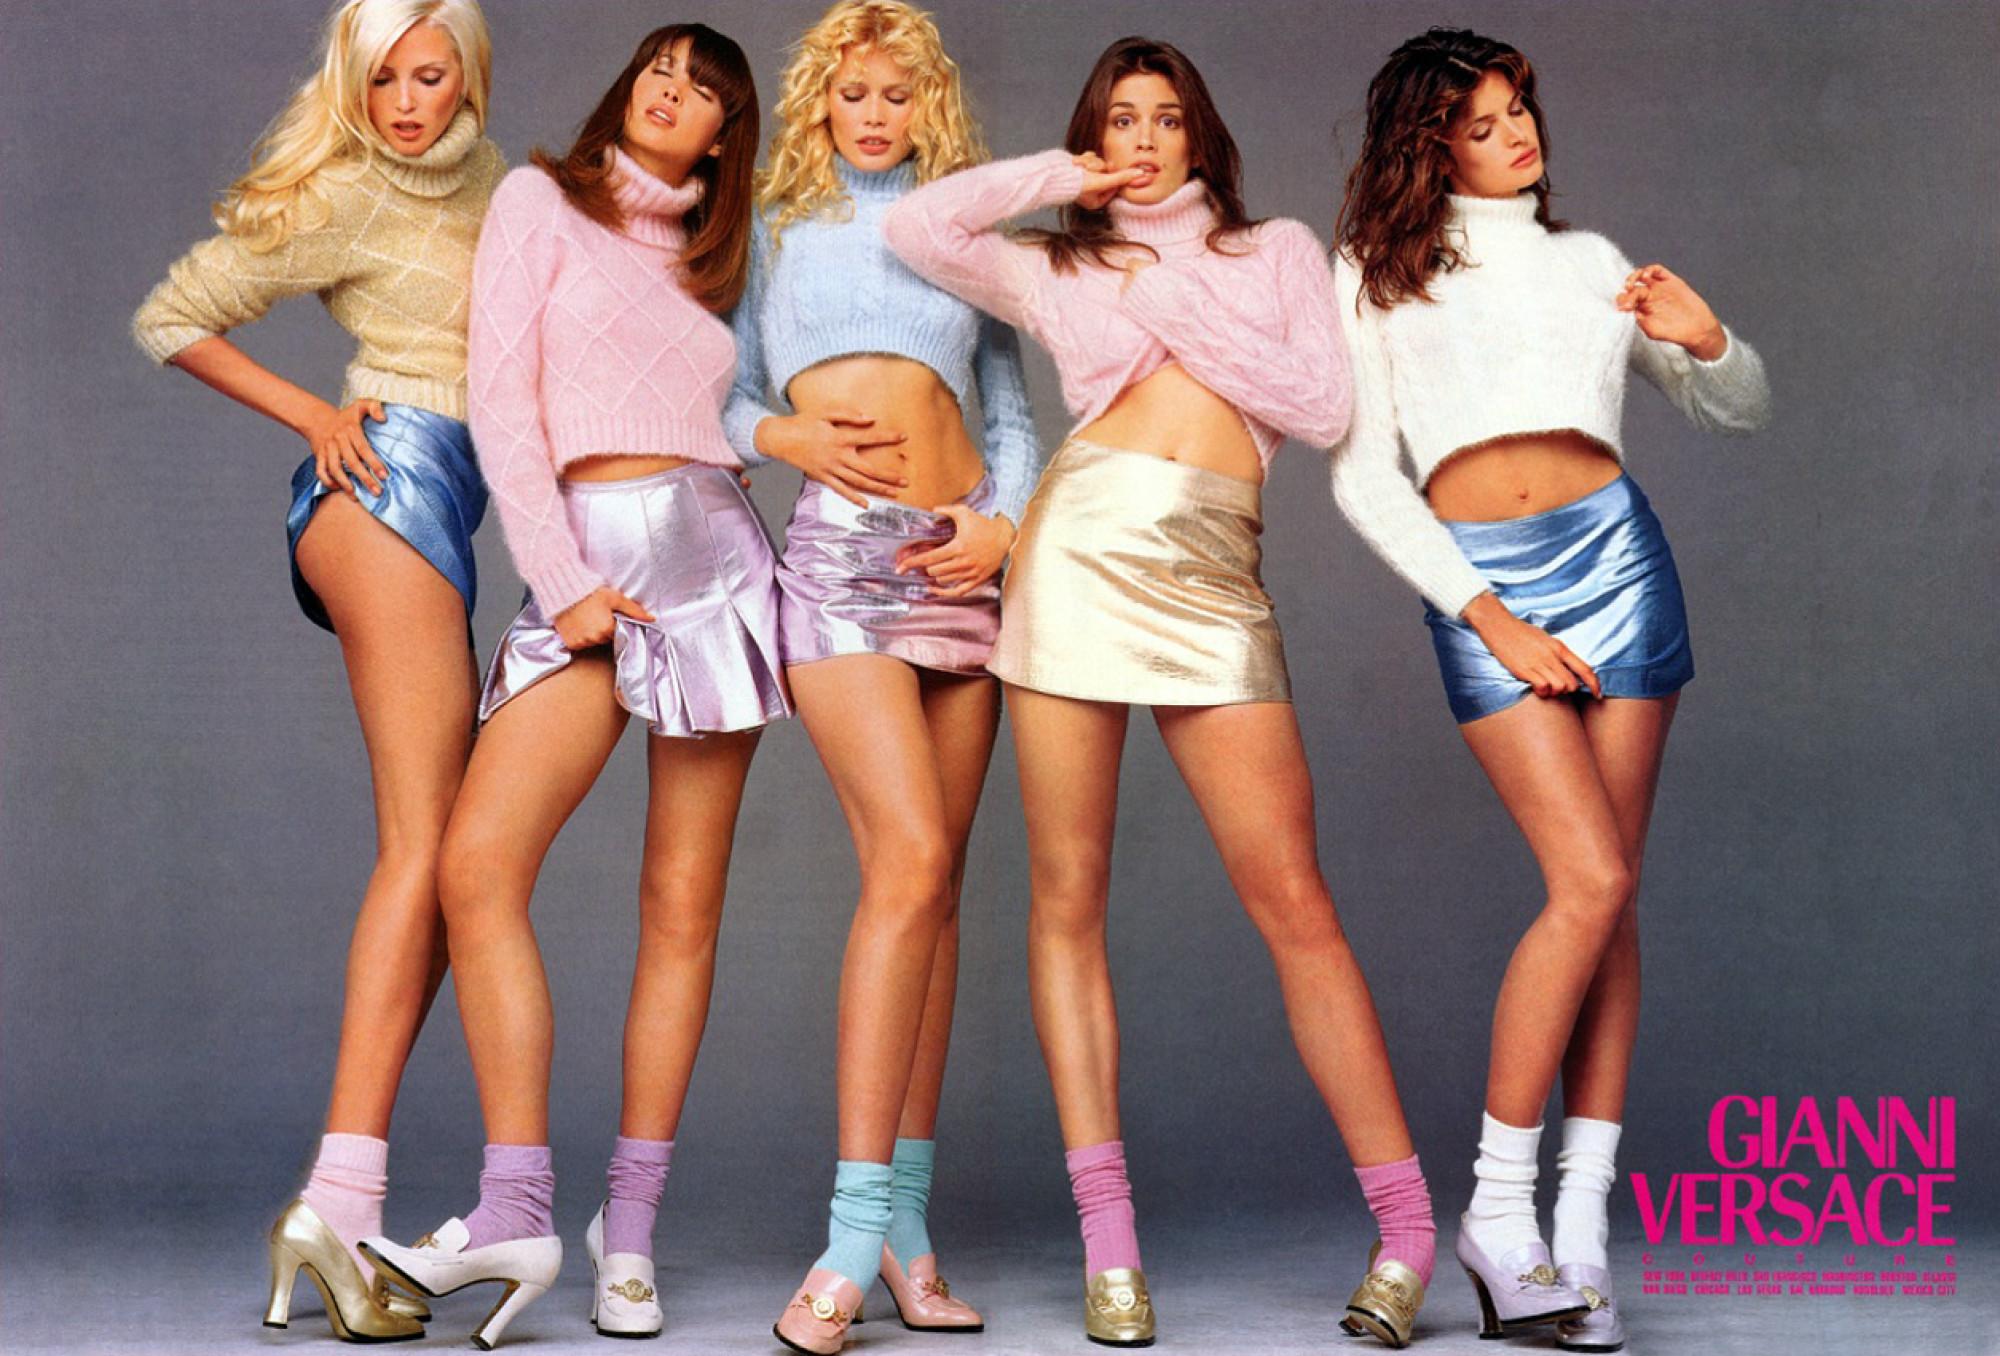 Versace Fall/Winter 1994 campaign by Richard Avedon (Photo credit: Richard Avedon / Versace)